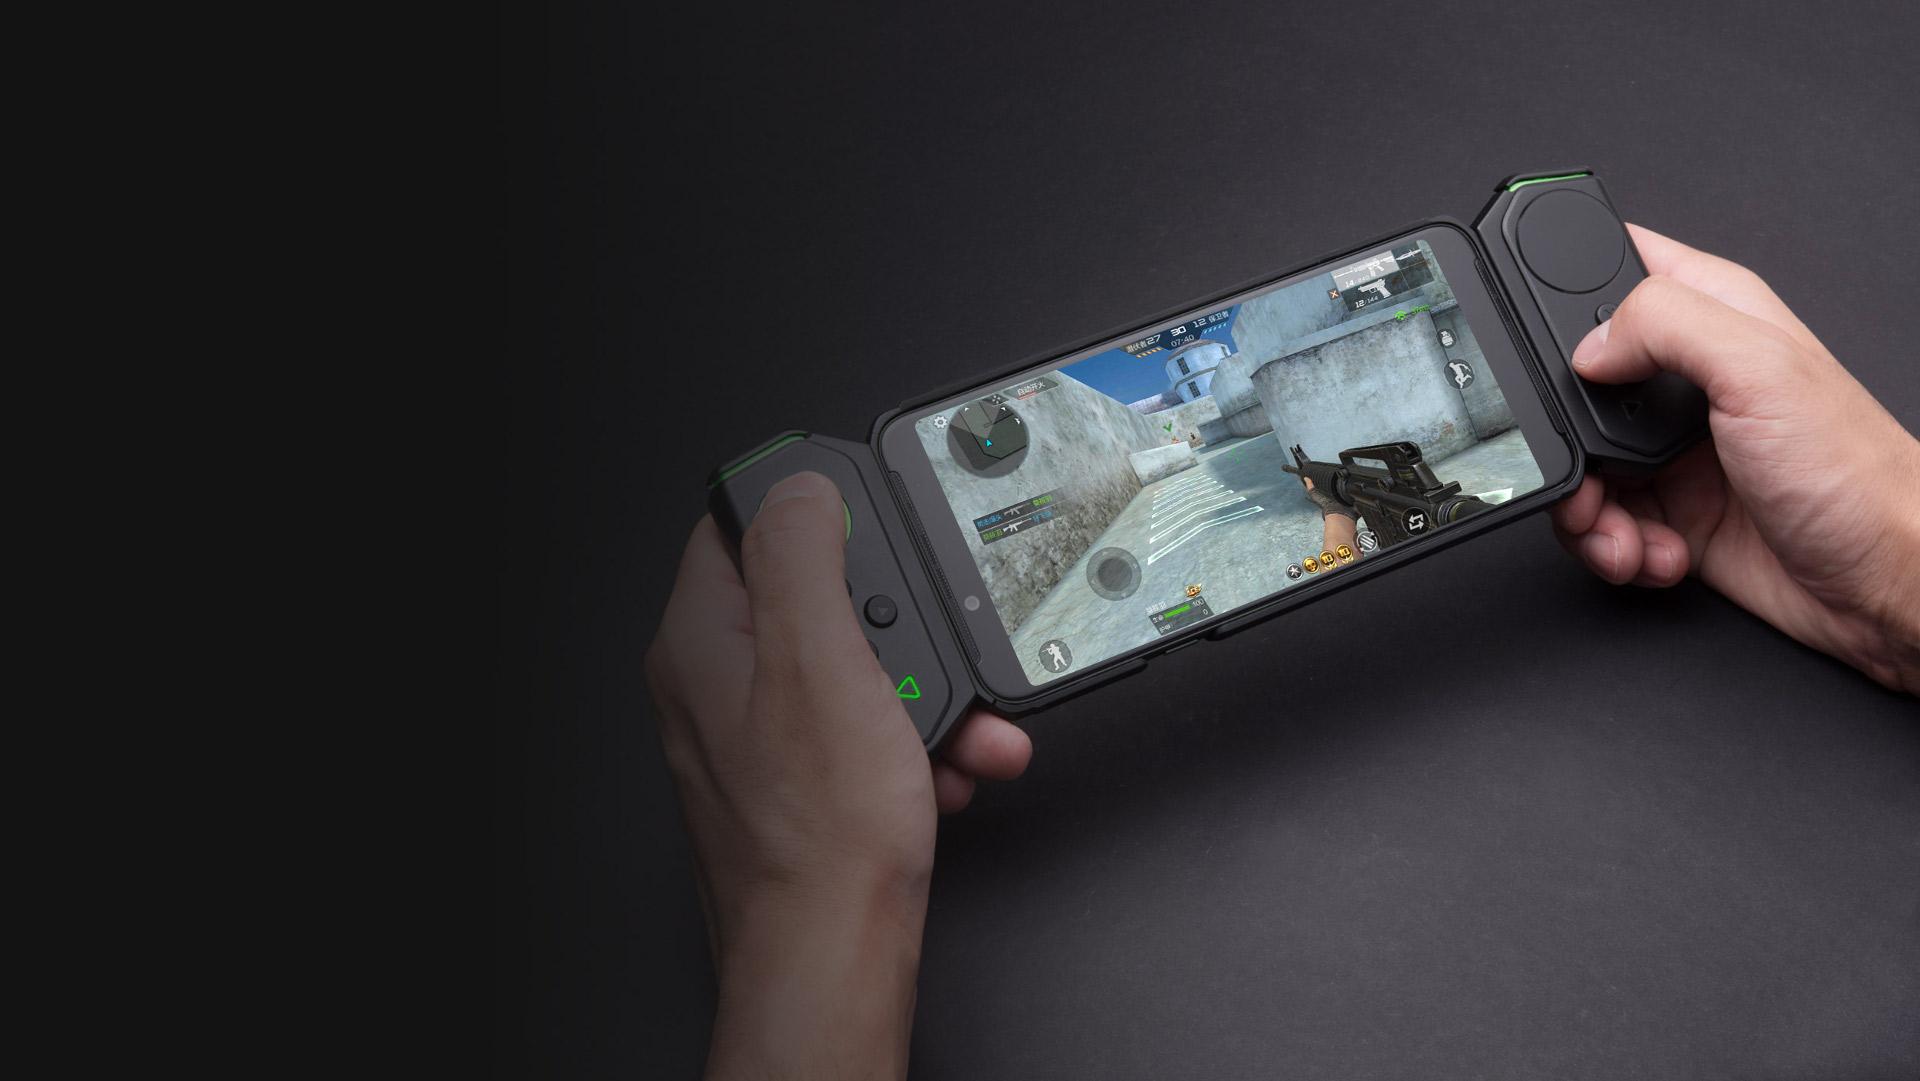 Smartphone chơi game Xiaomi Black Shark 2 xuất hiện trên Geekbench, Snapdragon 855, 12GB RAM